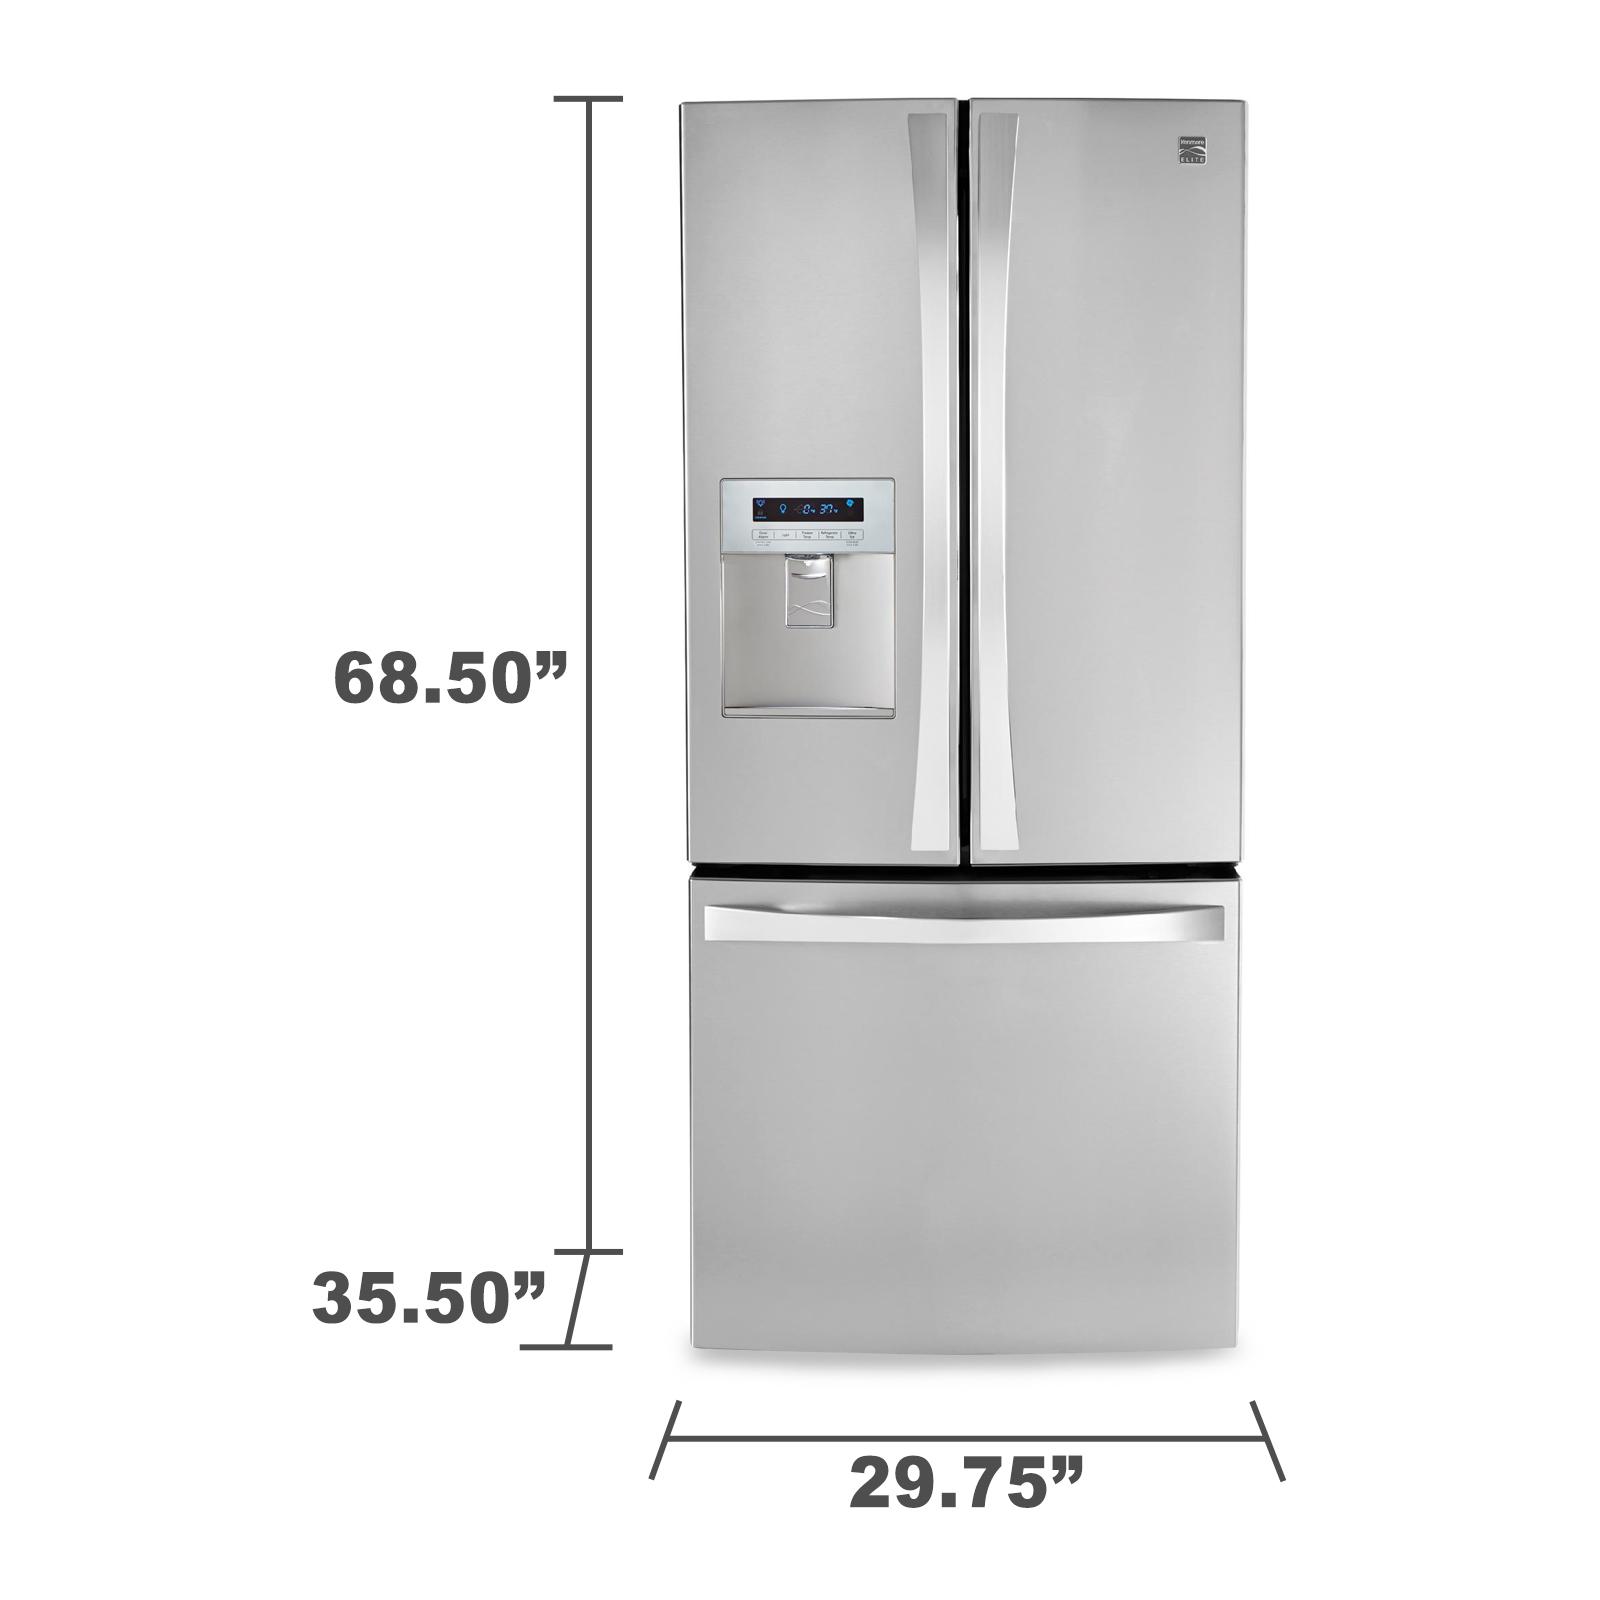 Kenmore Elite 71323 21.8 cu. ft. French Door Bottom-freezer Refrigerator w/ Water Dispenser - Stainless Steel